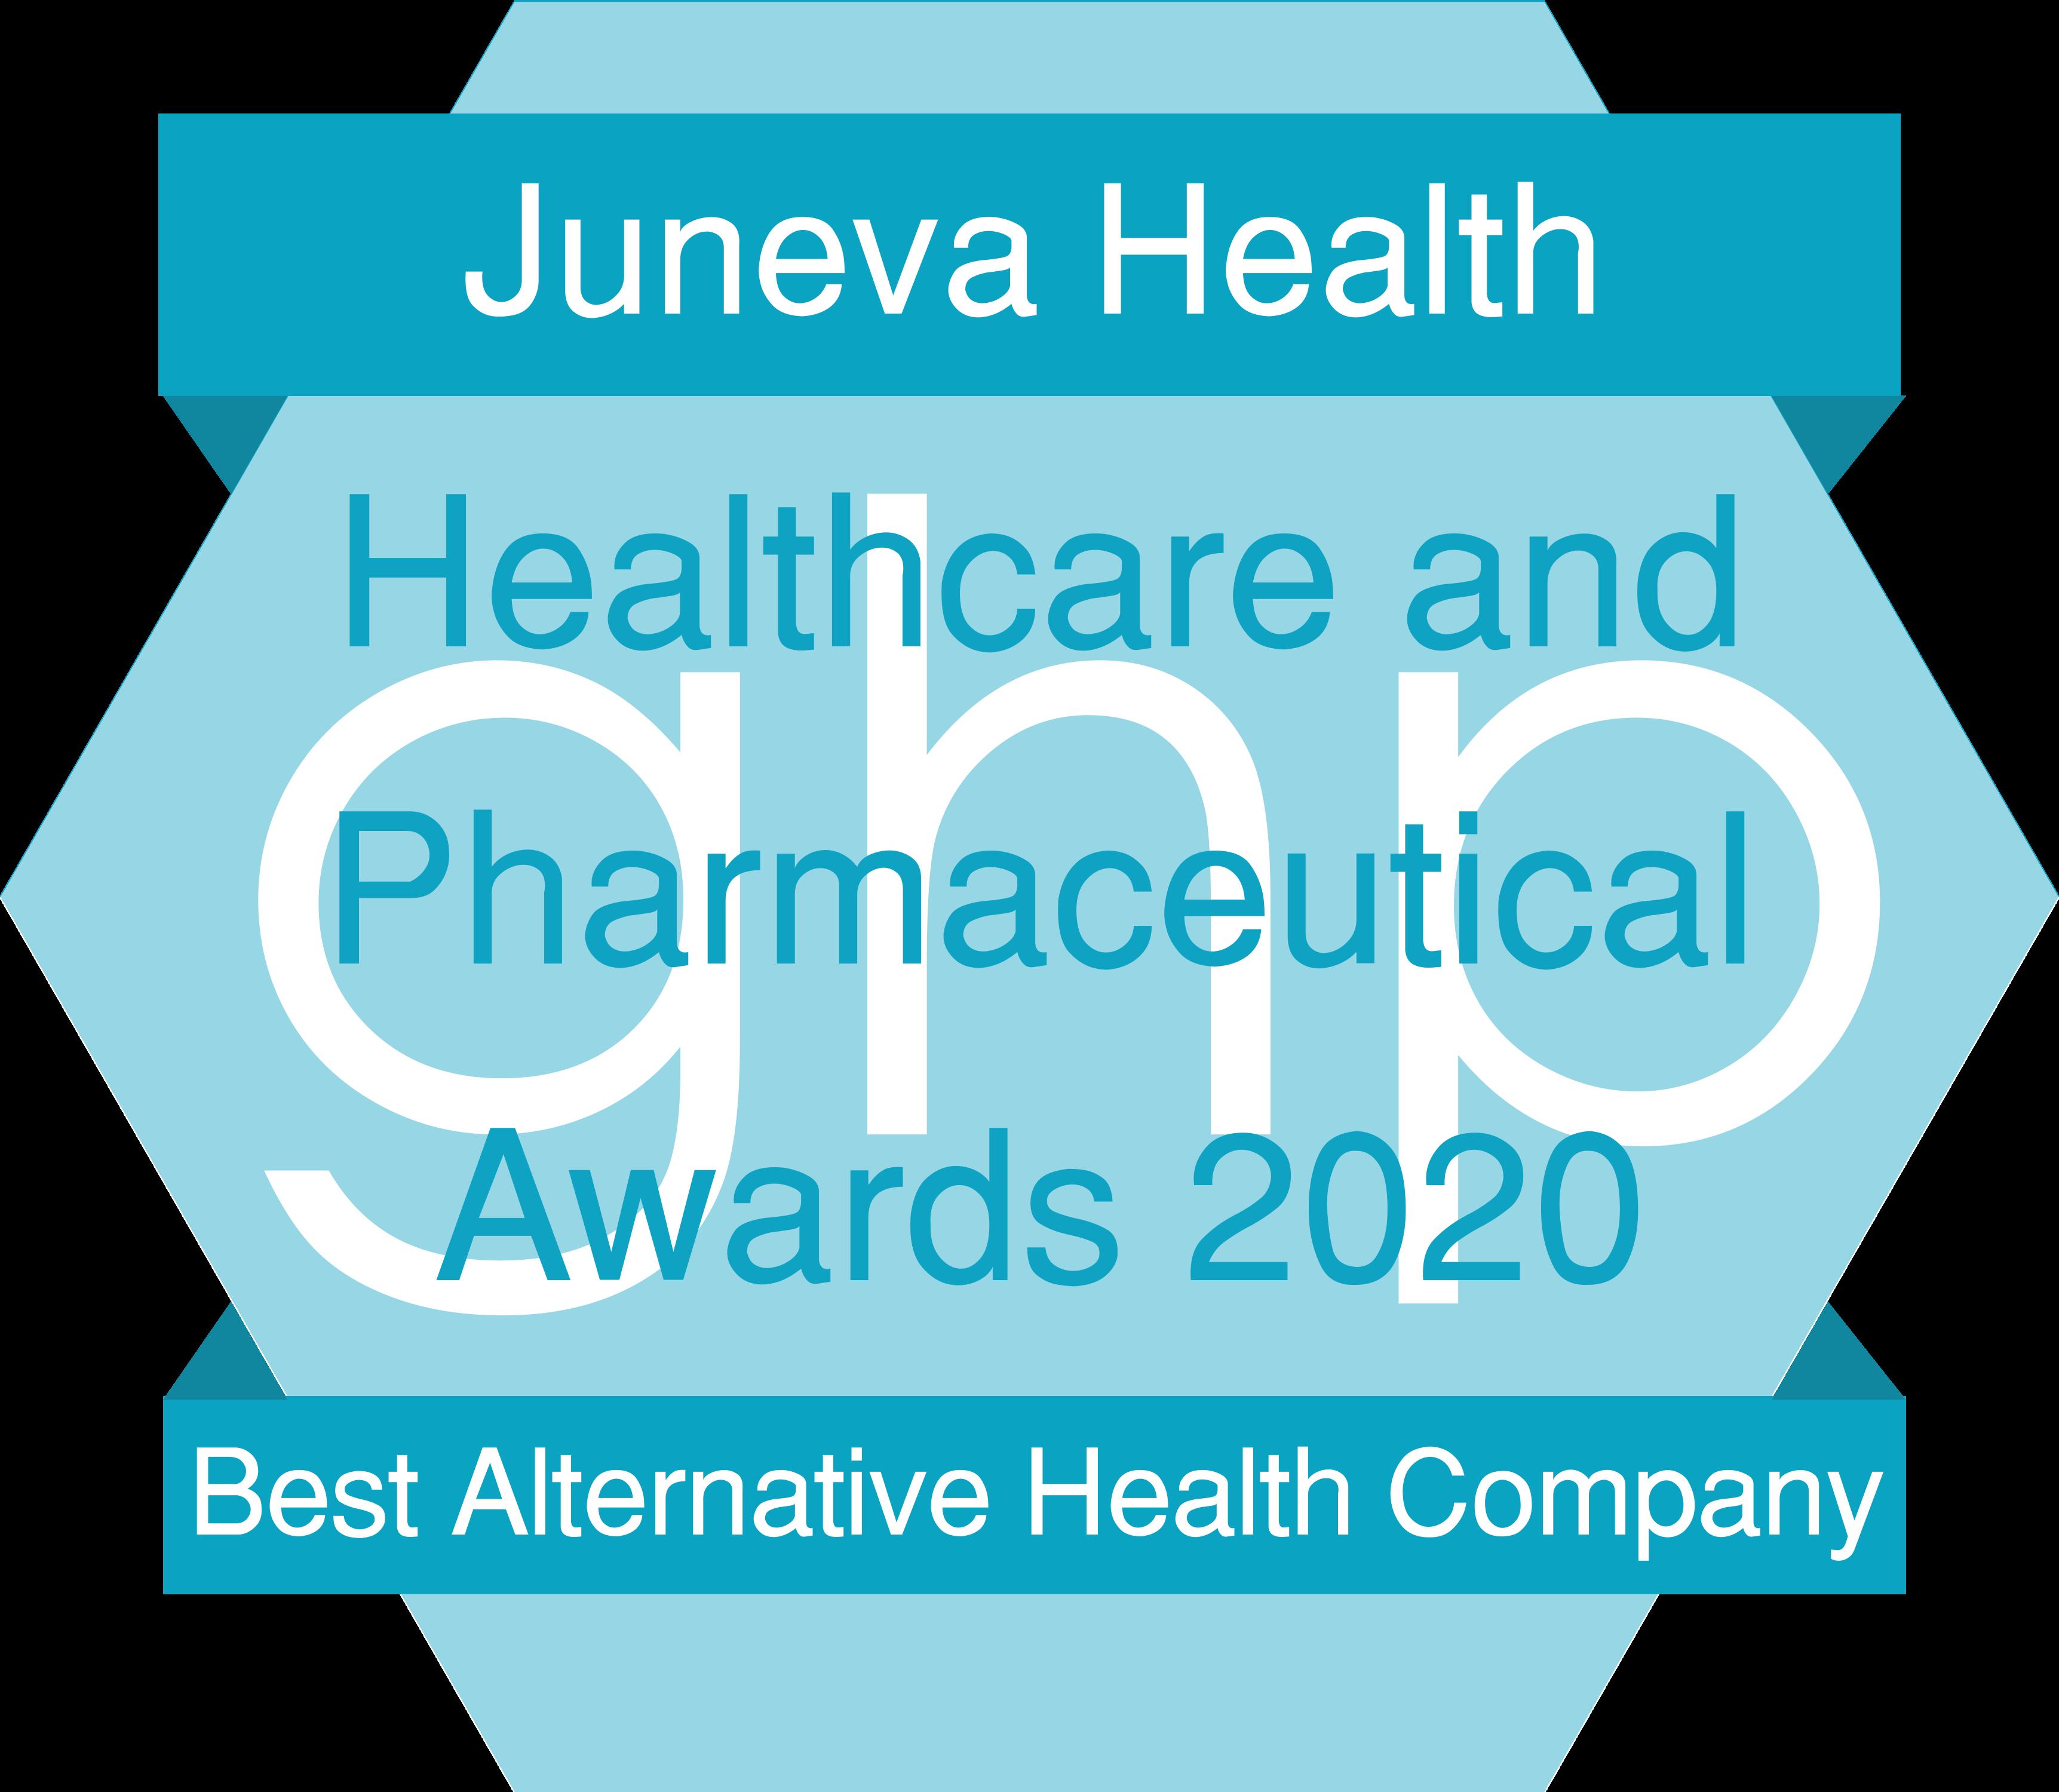 Juneva Health Best Alternative Health Company 2020